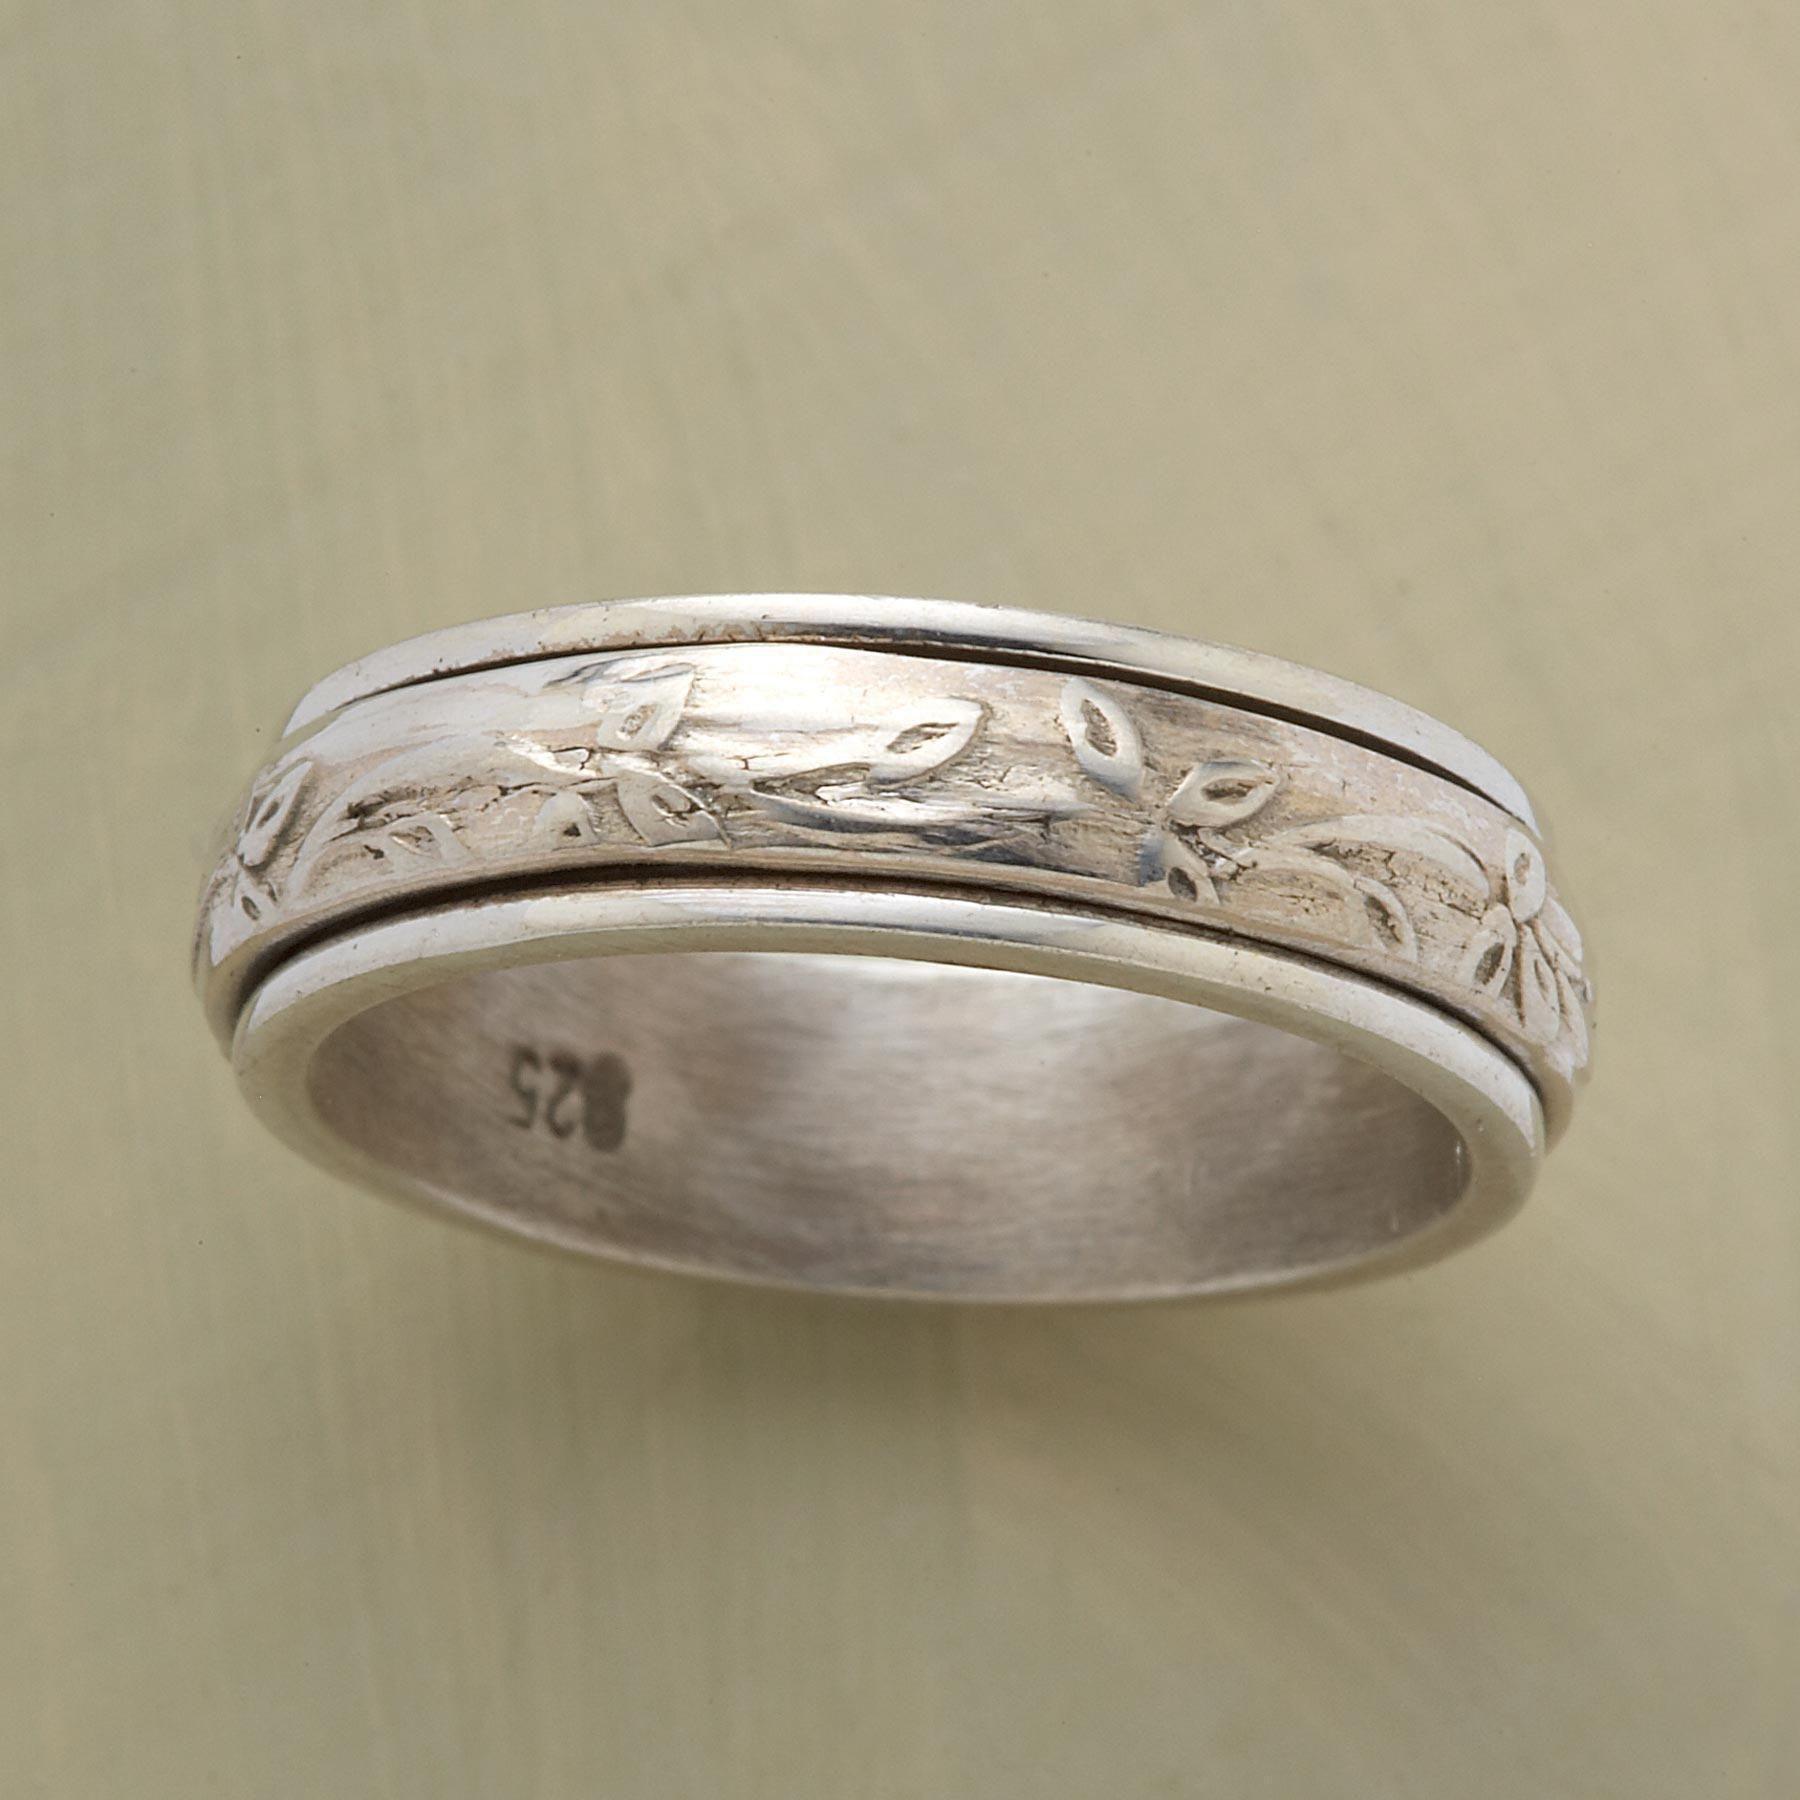 Serenity Ring Rings Spinner Rings Rings Handmade Rings